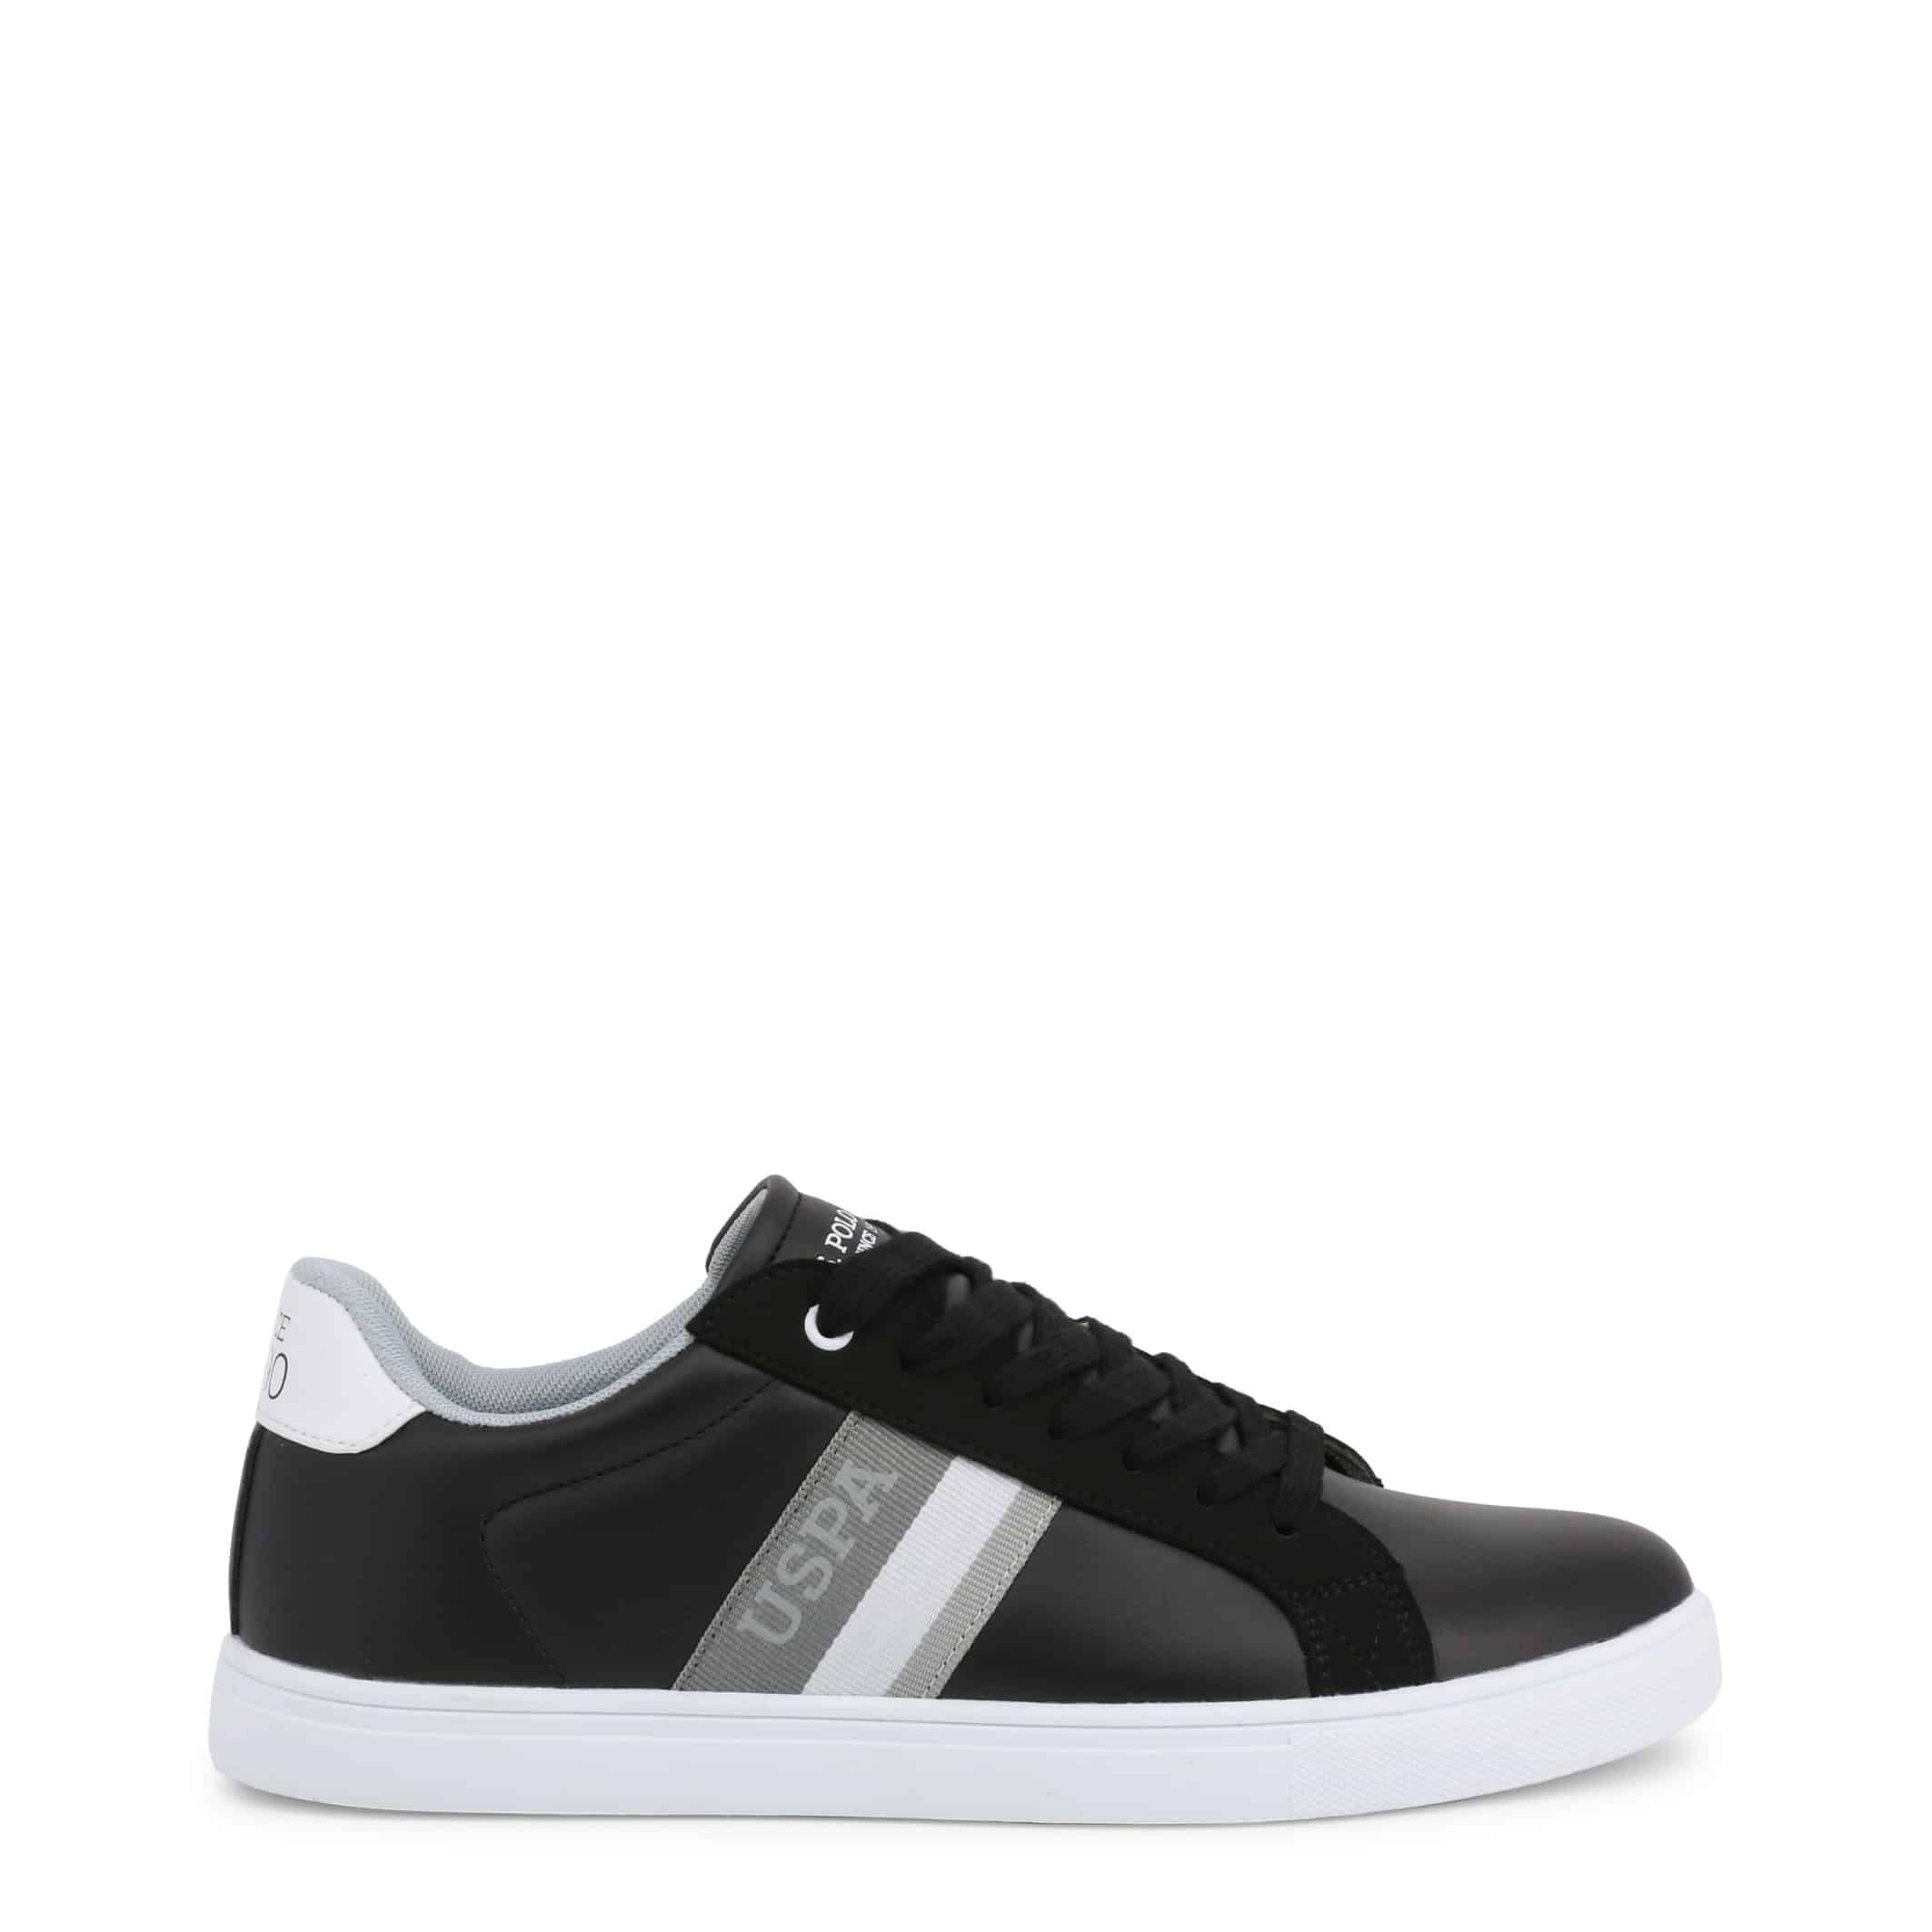 Schuhe U.S. Polo Assn. – CURTY4264S0_Y1 – Schwarz